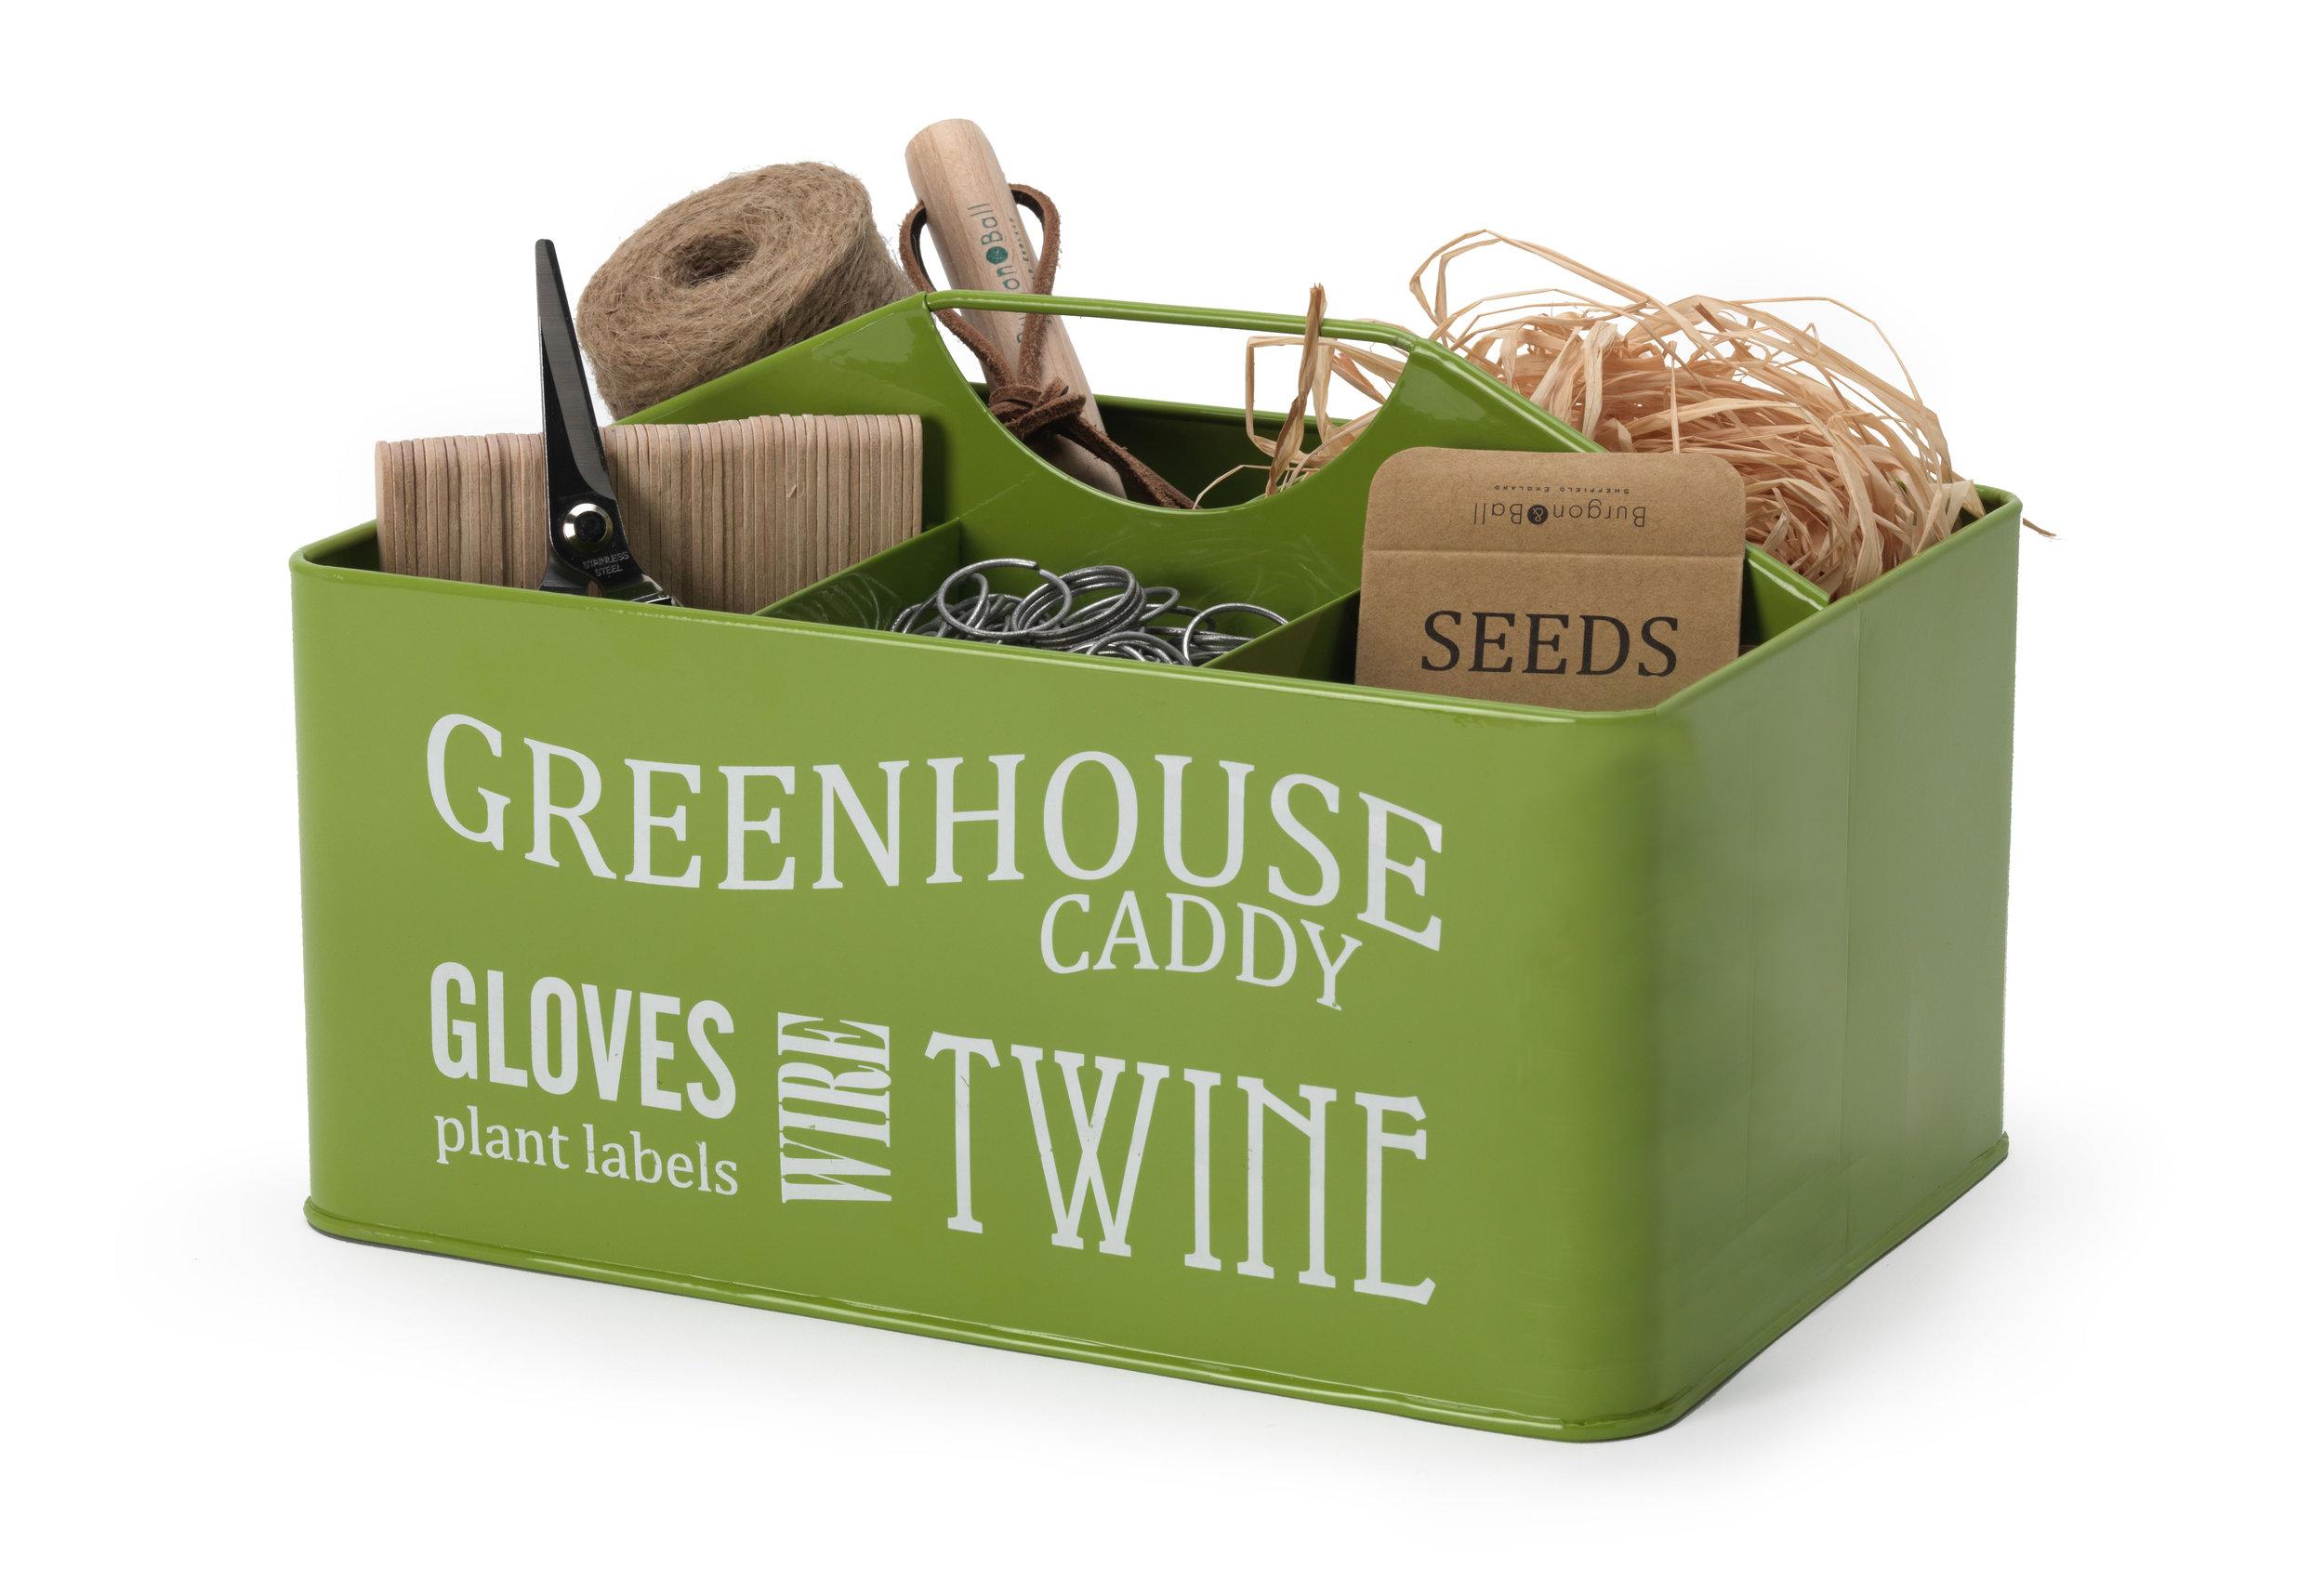 Greenhouse Caddy